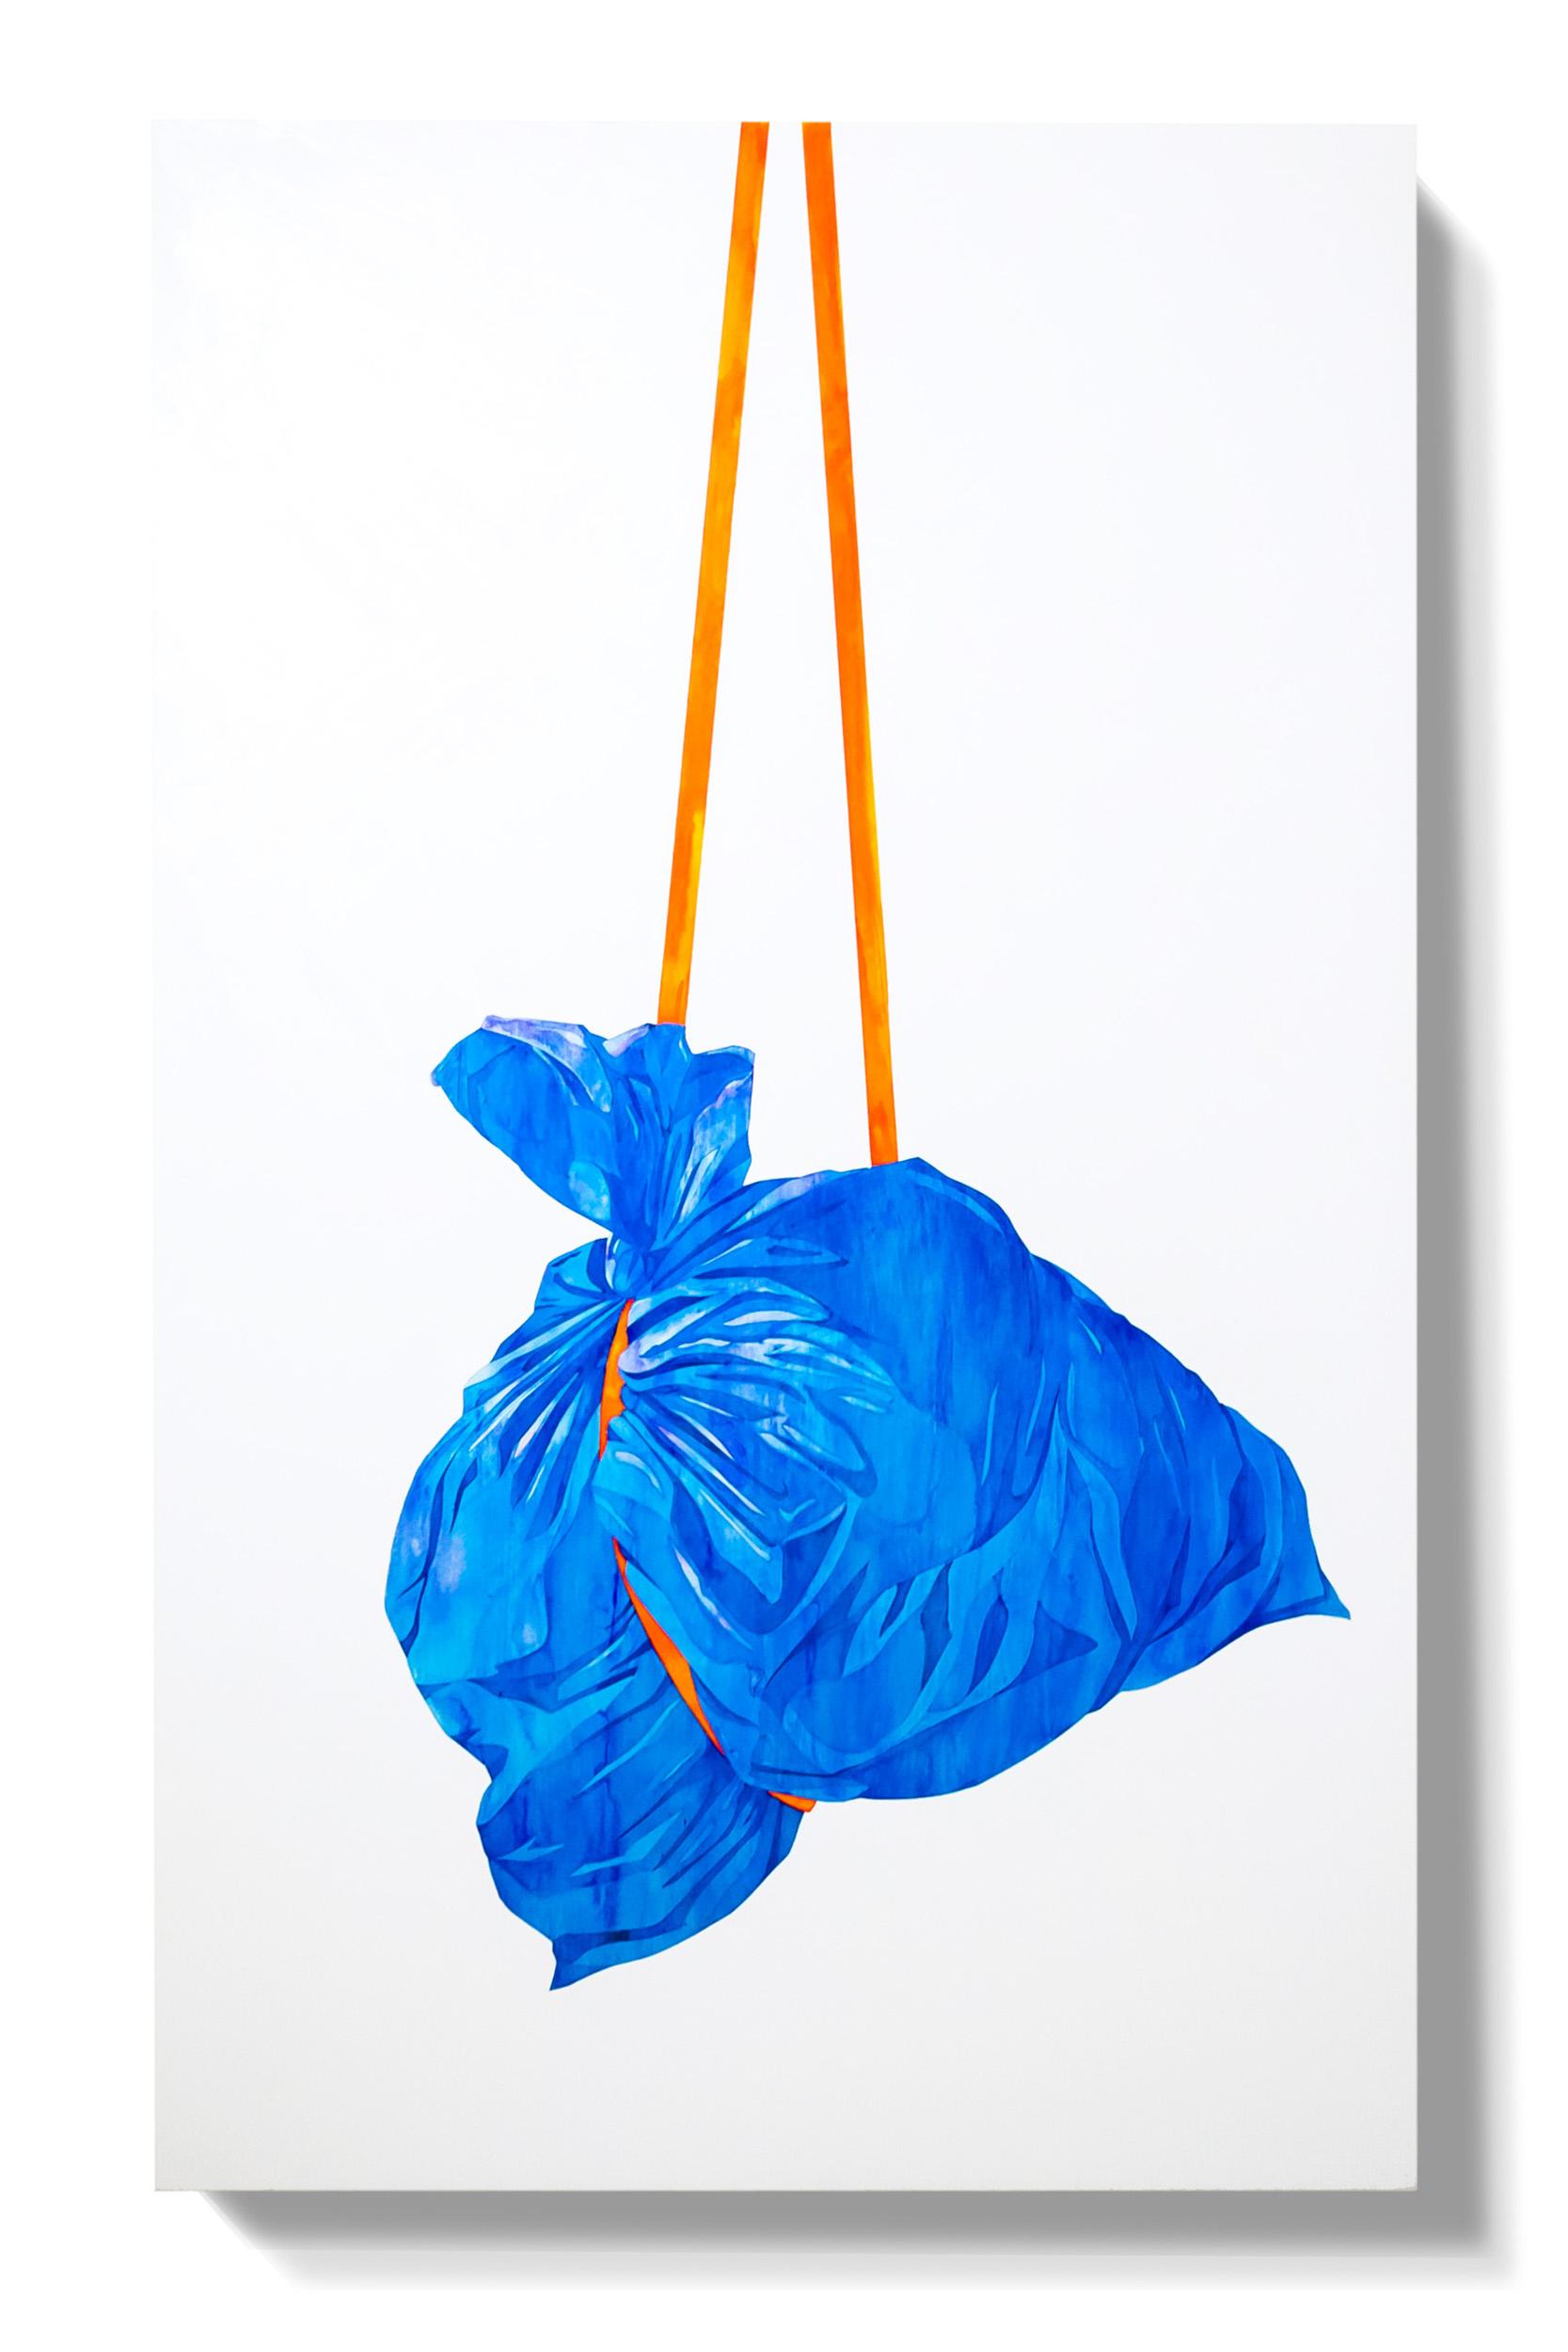 wassaic-project-artist-ryder-richards-trash-painting-2-2018-10-08-10-28-12.jpg